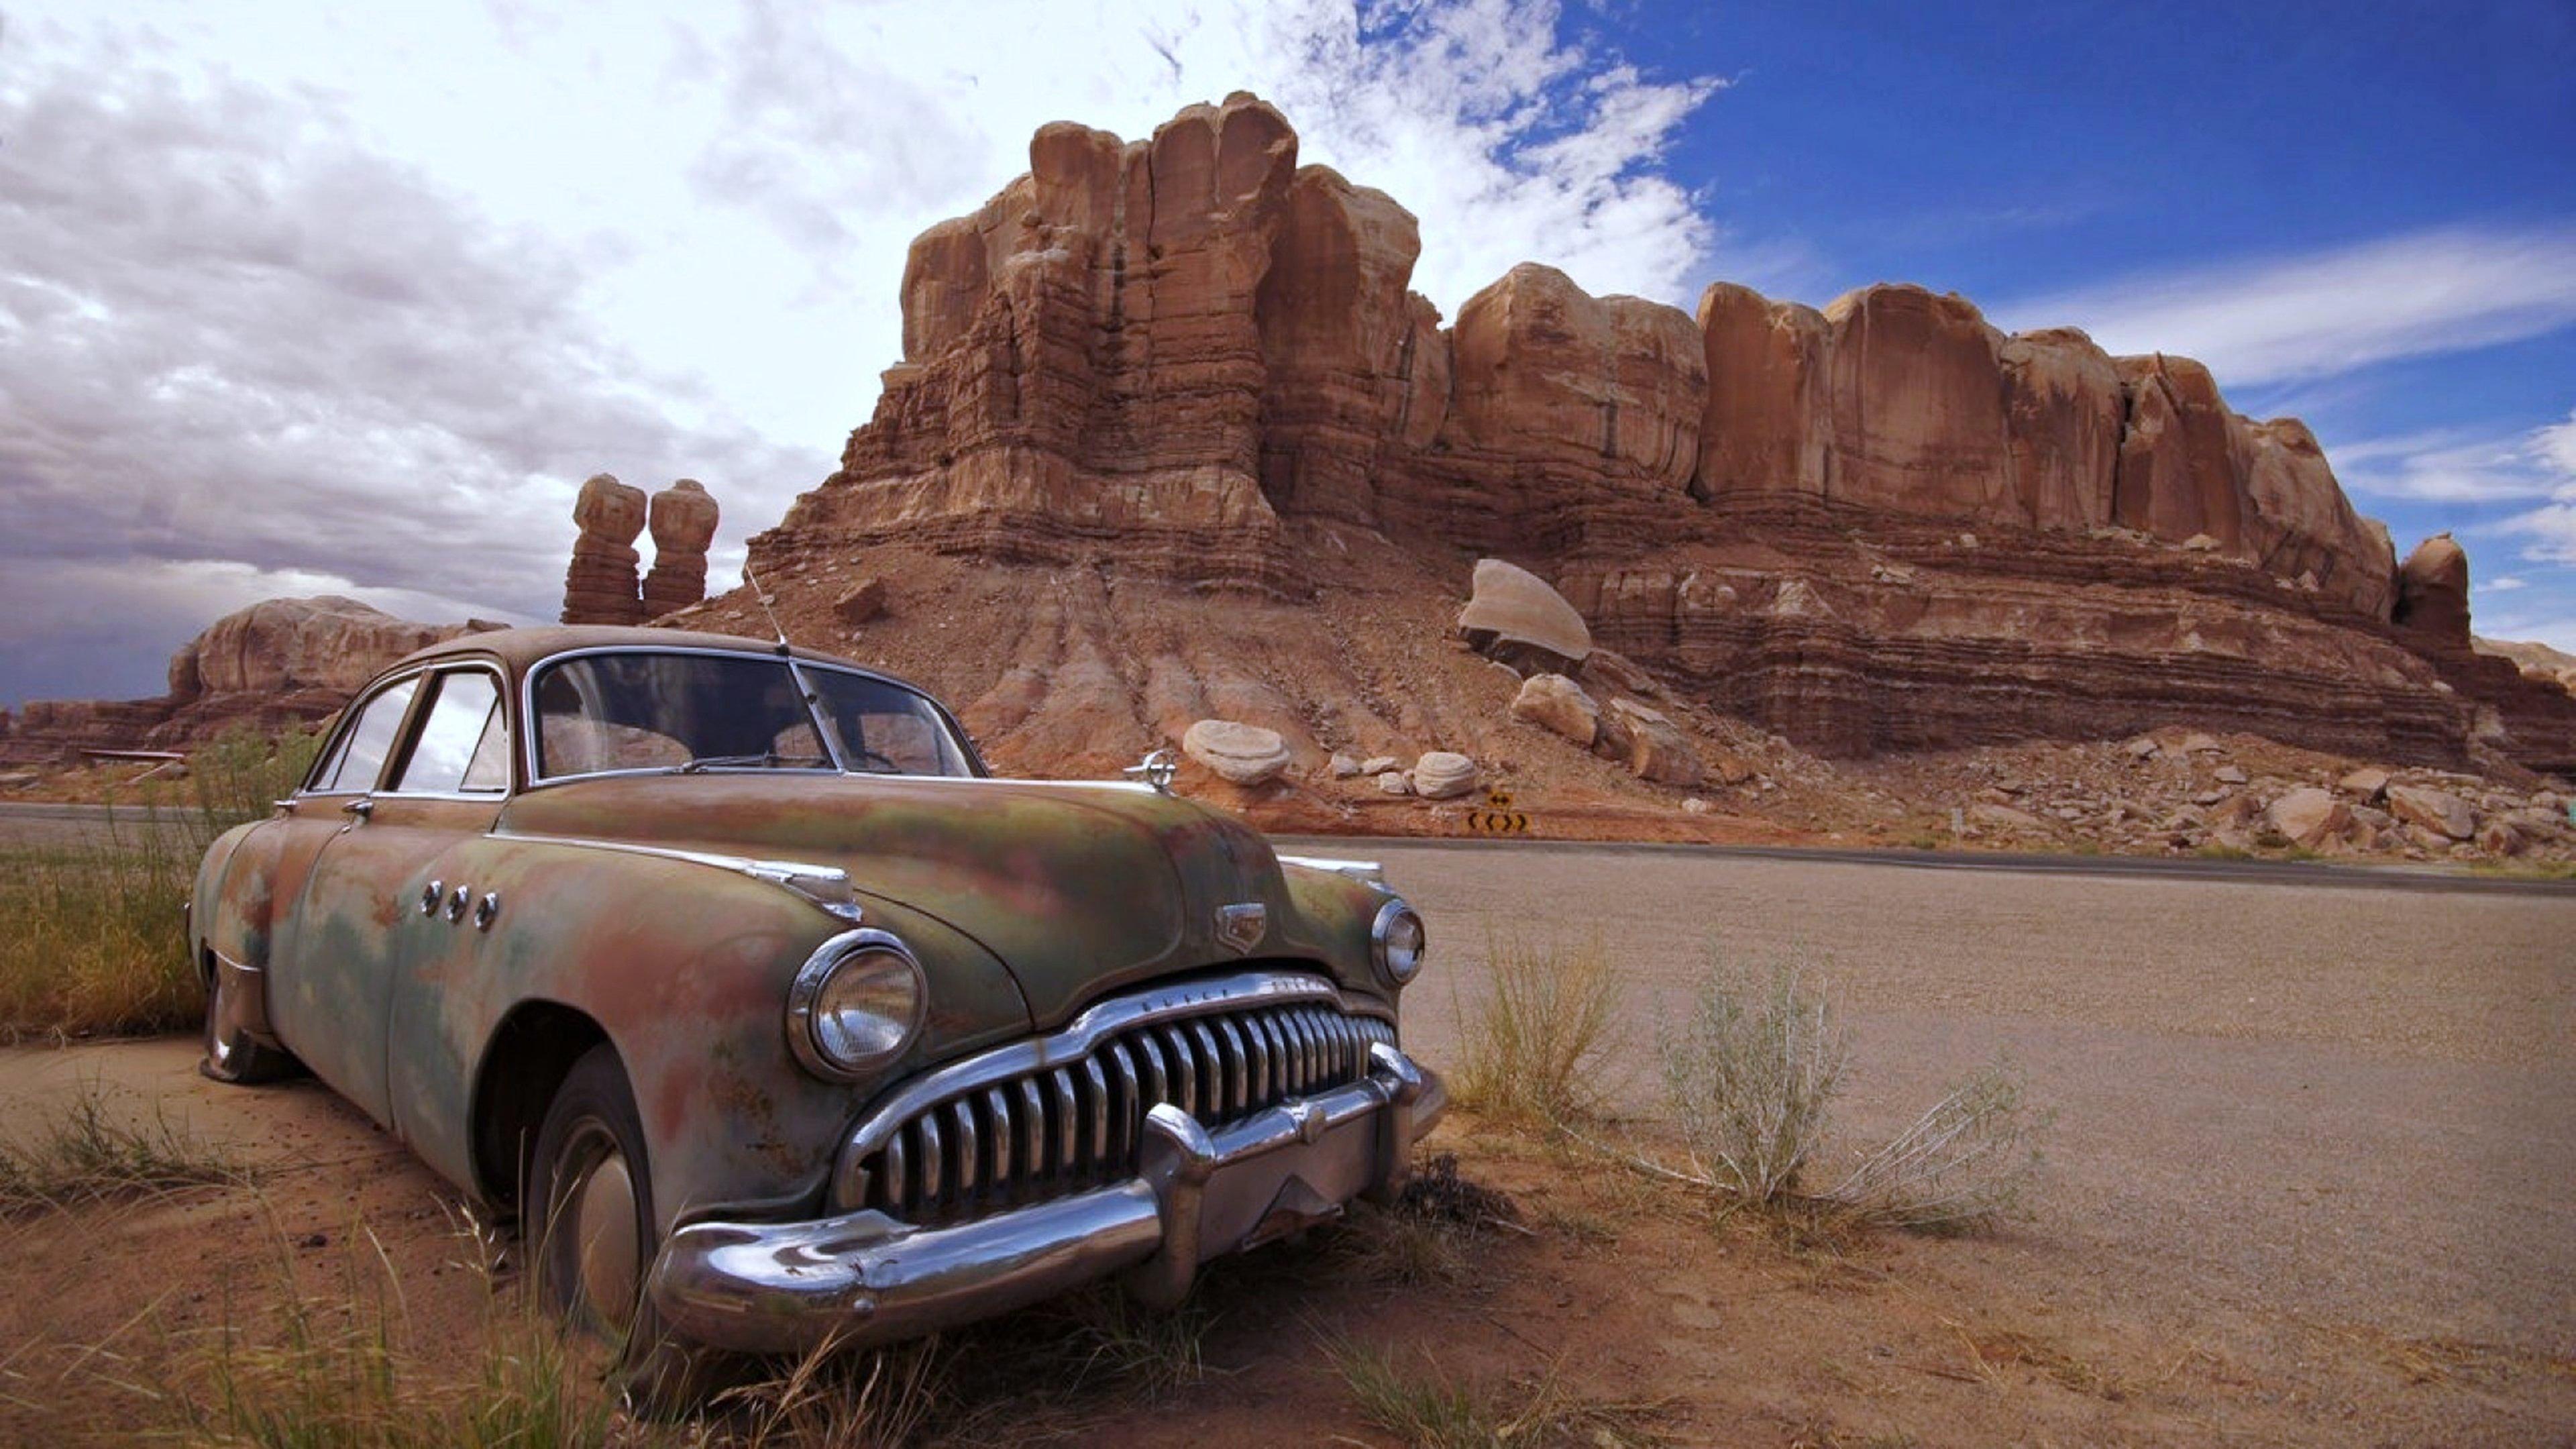 Desert Old Cars Landscape Nature Rocks Mountains Wallpaper Old Abandoned Cars 3840x2160 Download Hd Wallpaper Wallpapertip